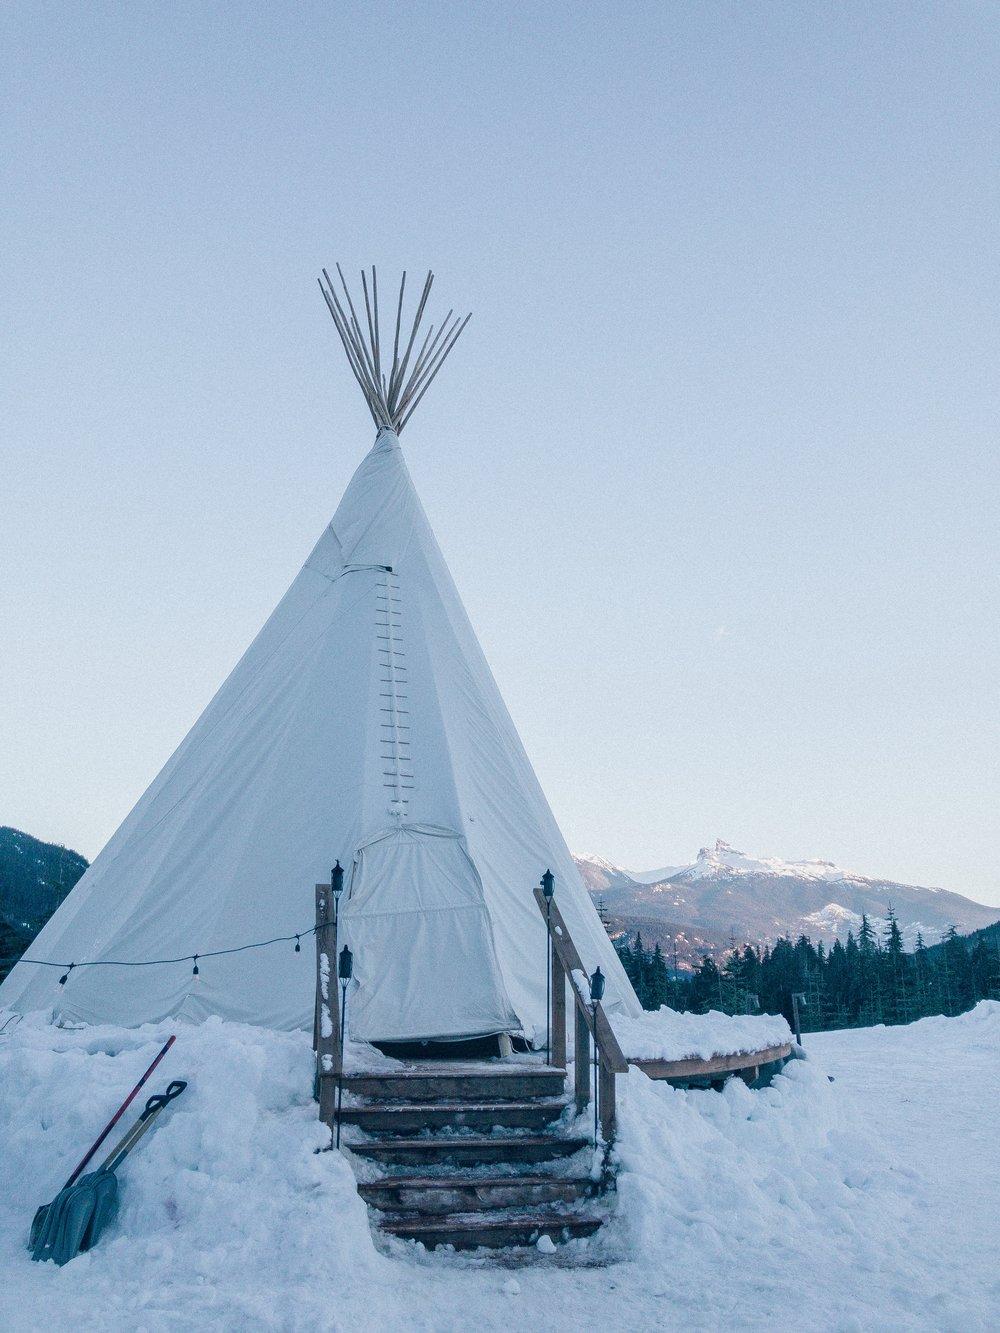 Whistler teepee in winter